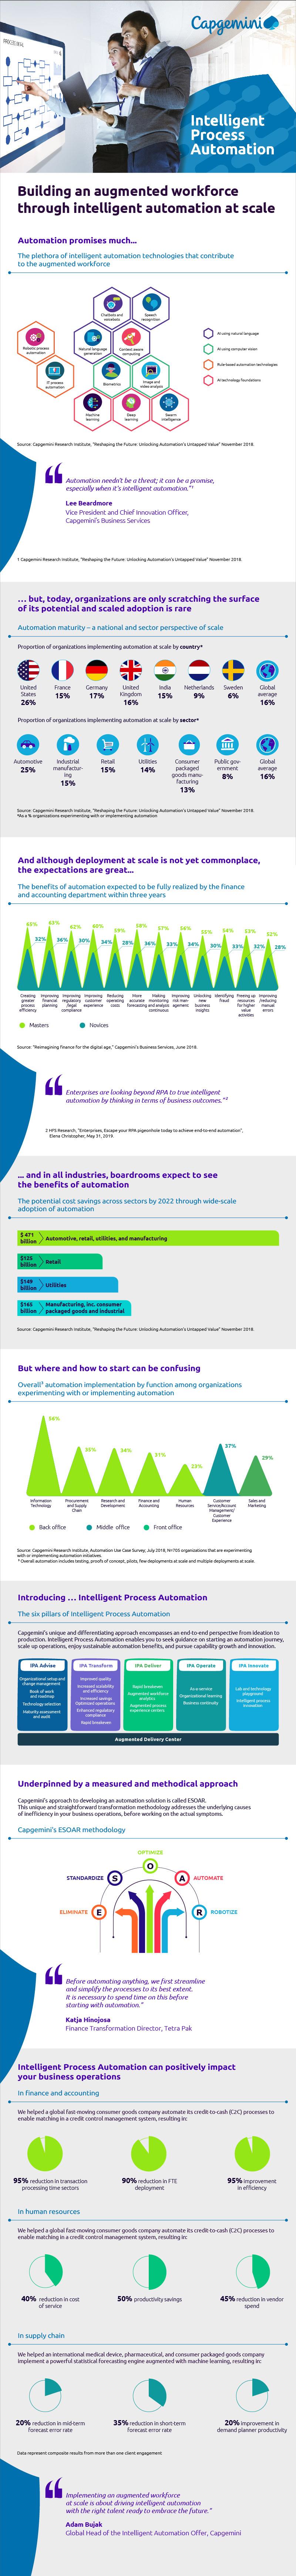 Intelligent Process Automation – Infographic